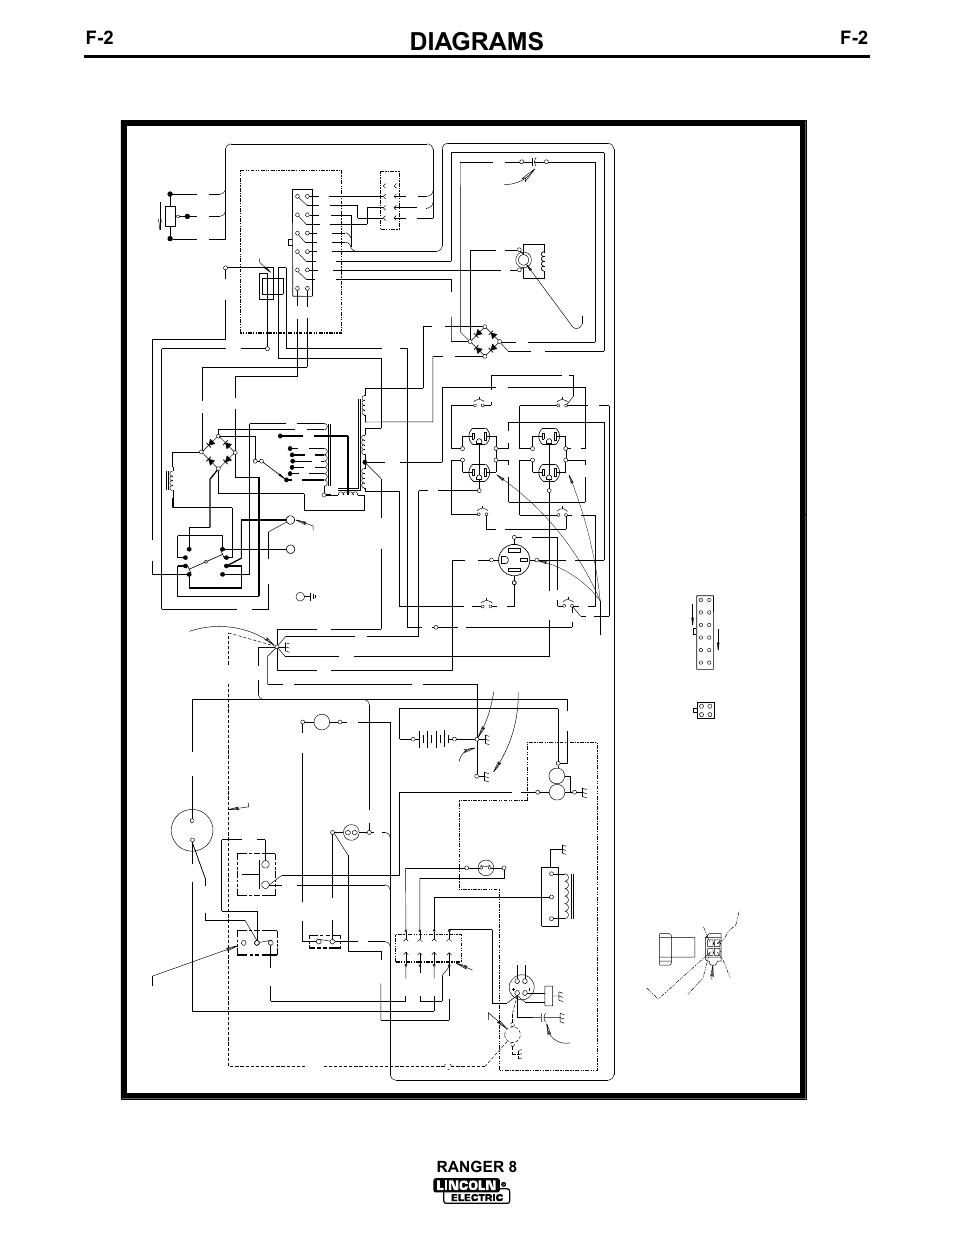 lincoln ranger 8 wiring diagram